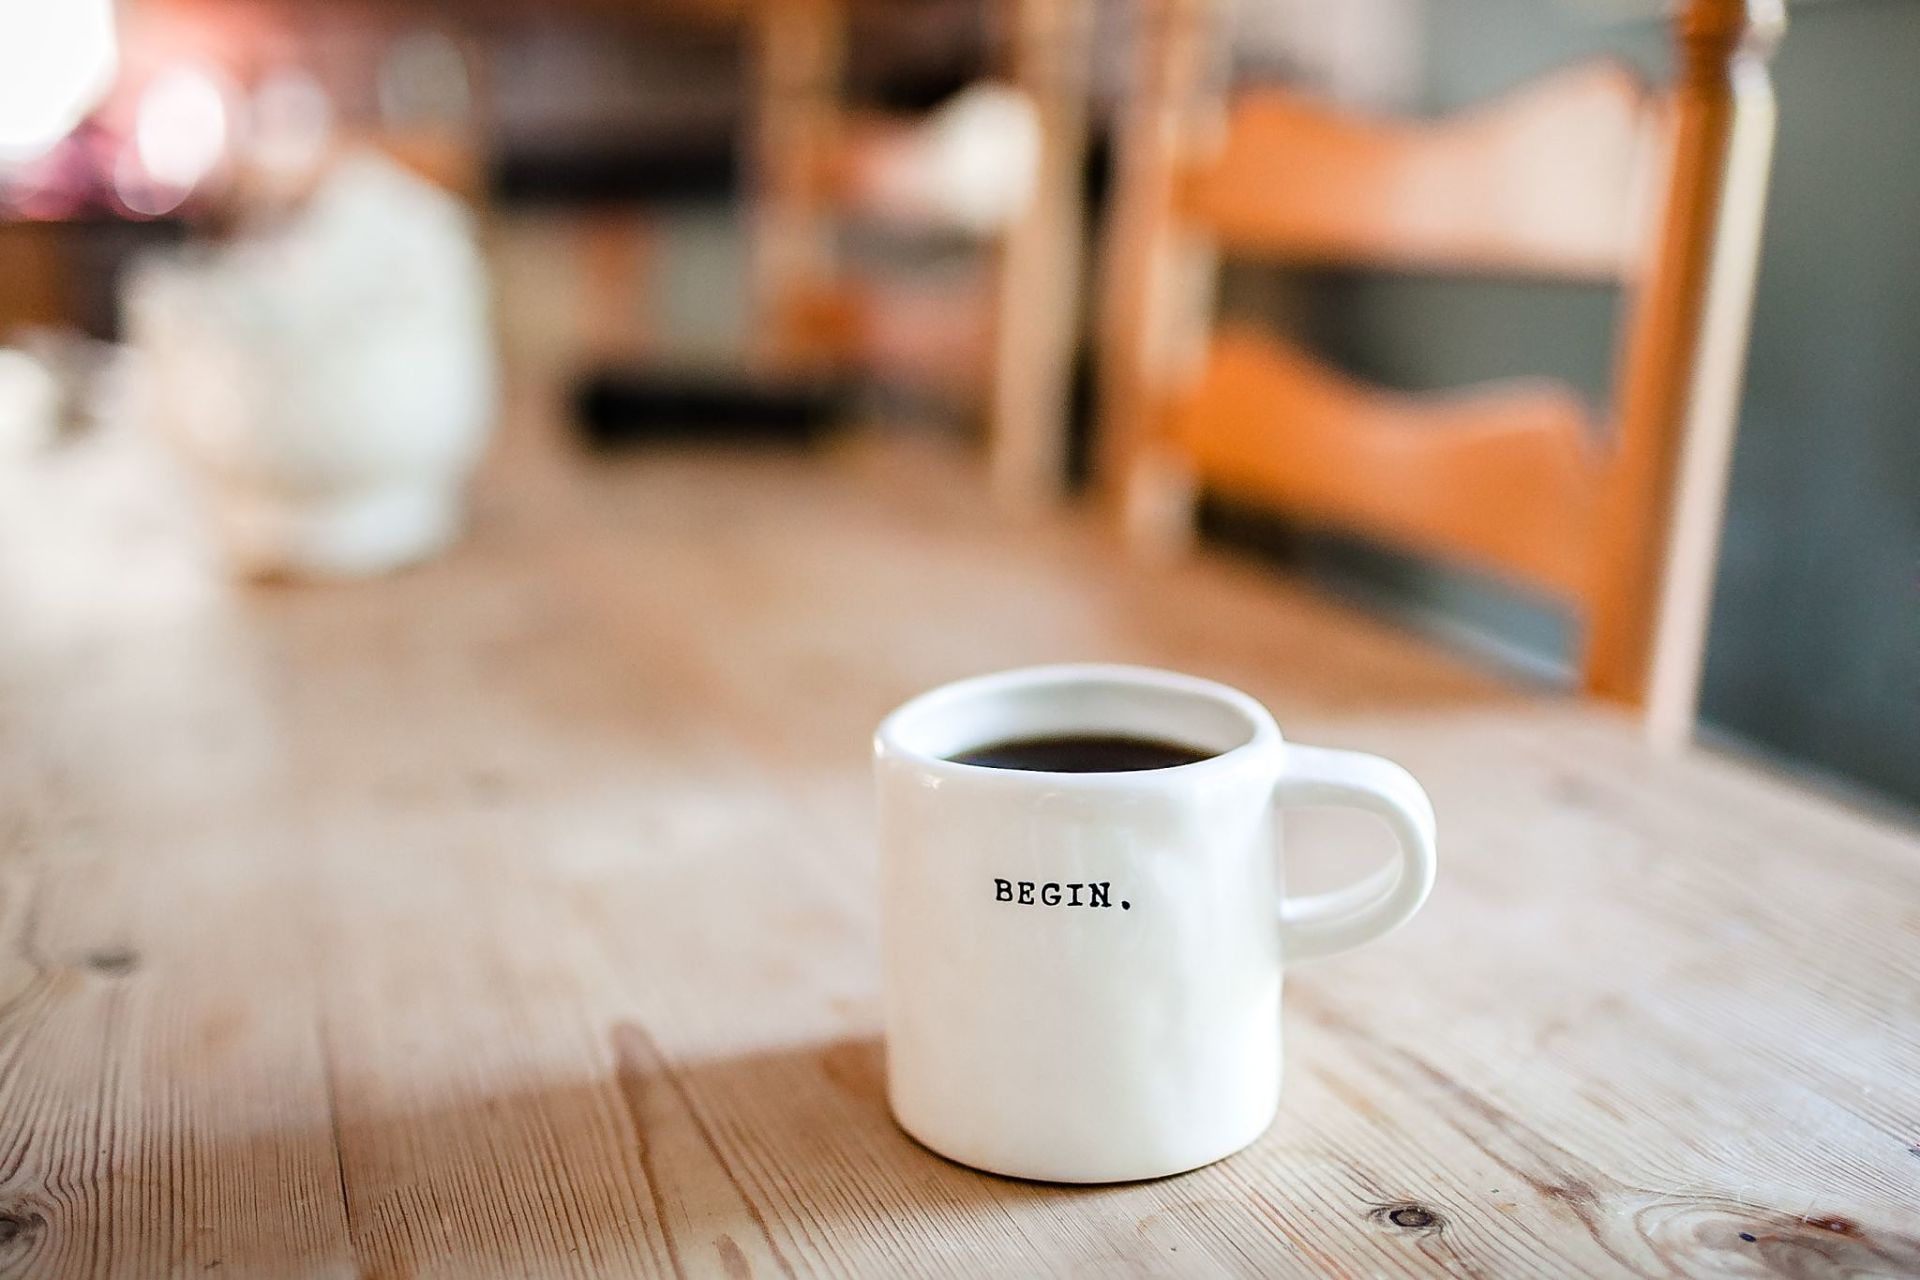 coffee-mug-says-begin